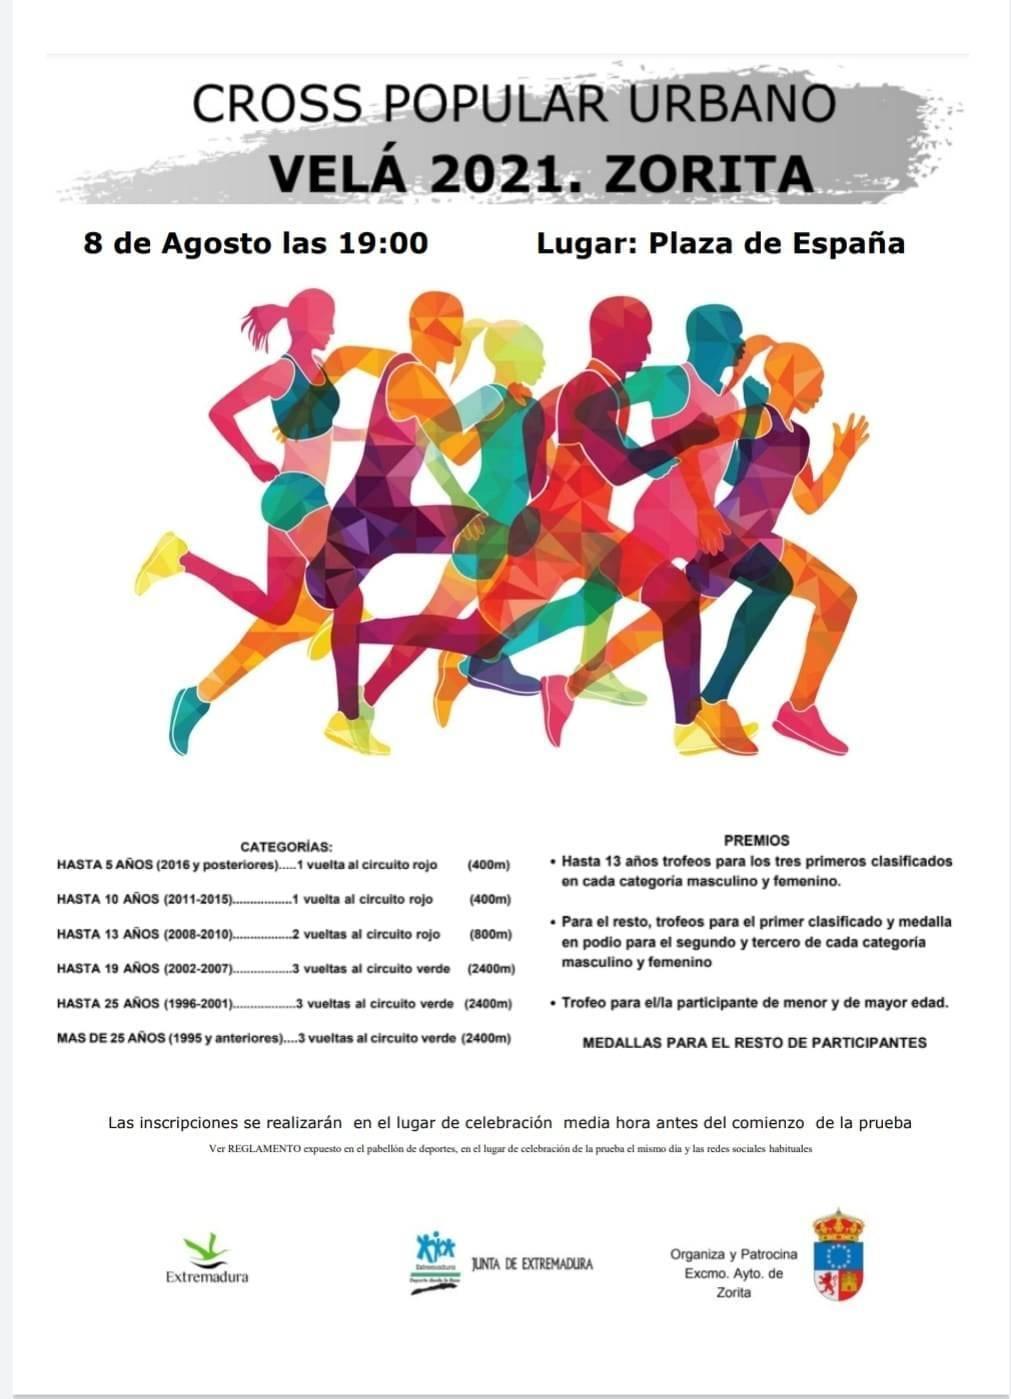 Cross popular urbano (2021) - Zorita (Cáceres)